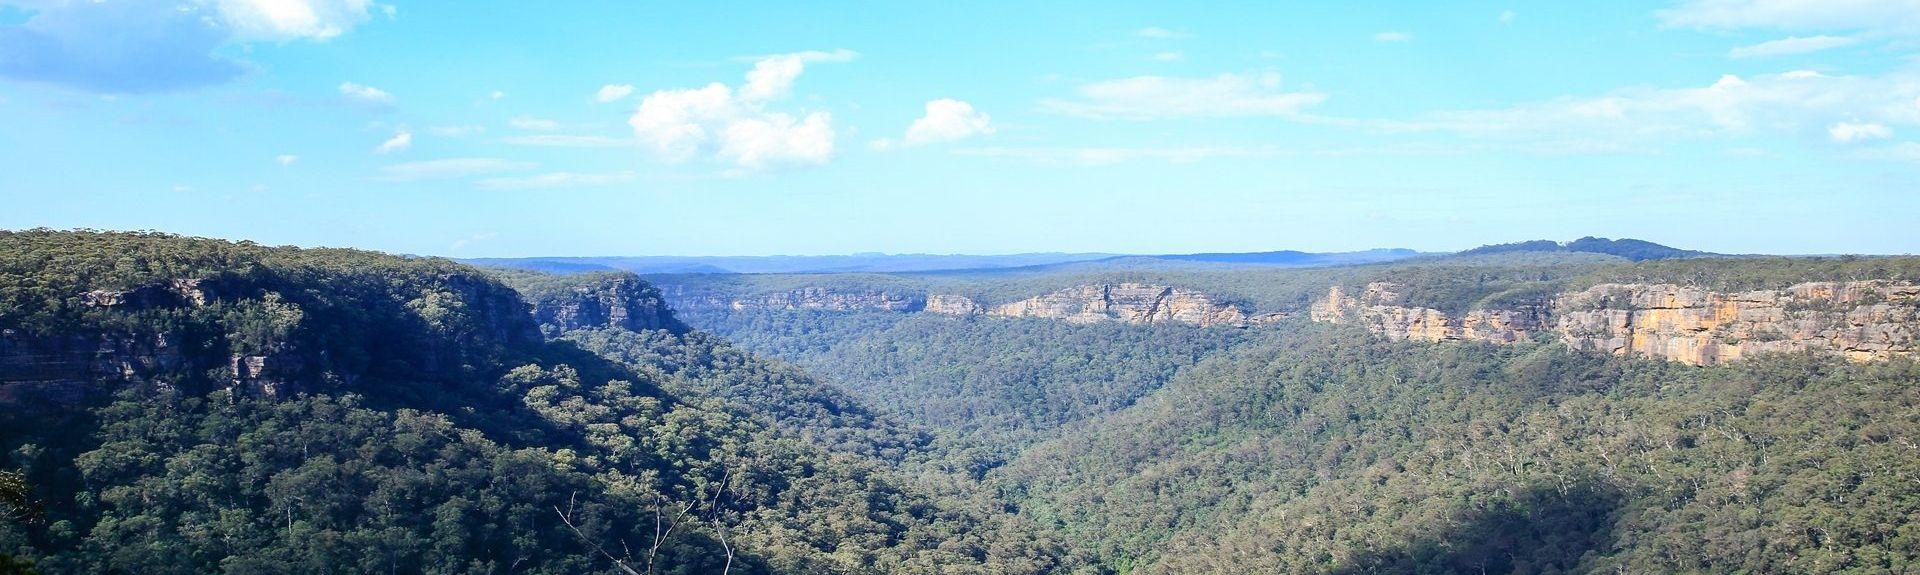 Bundanoon, New South Wales, Australia